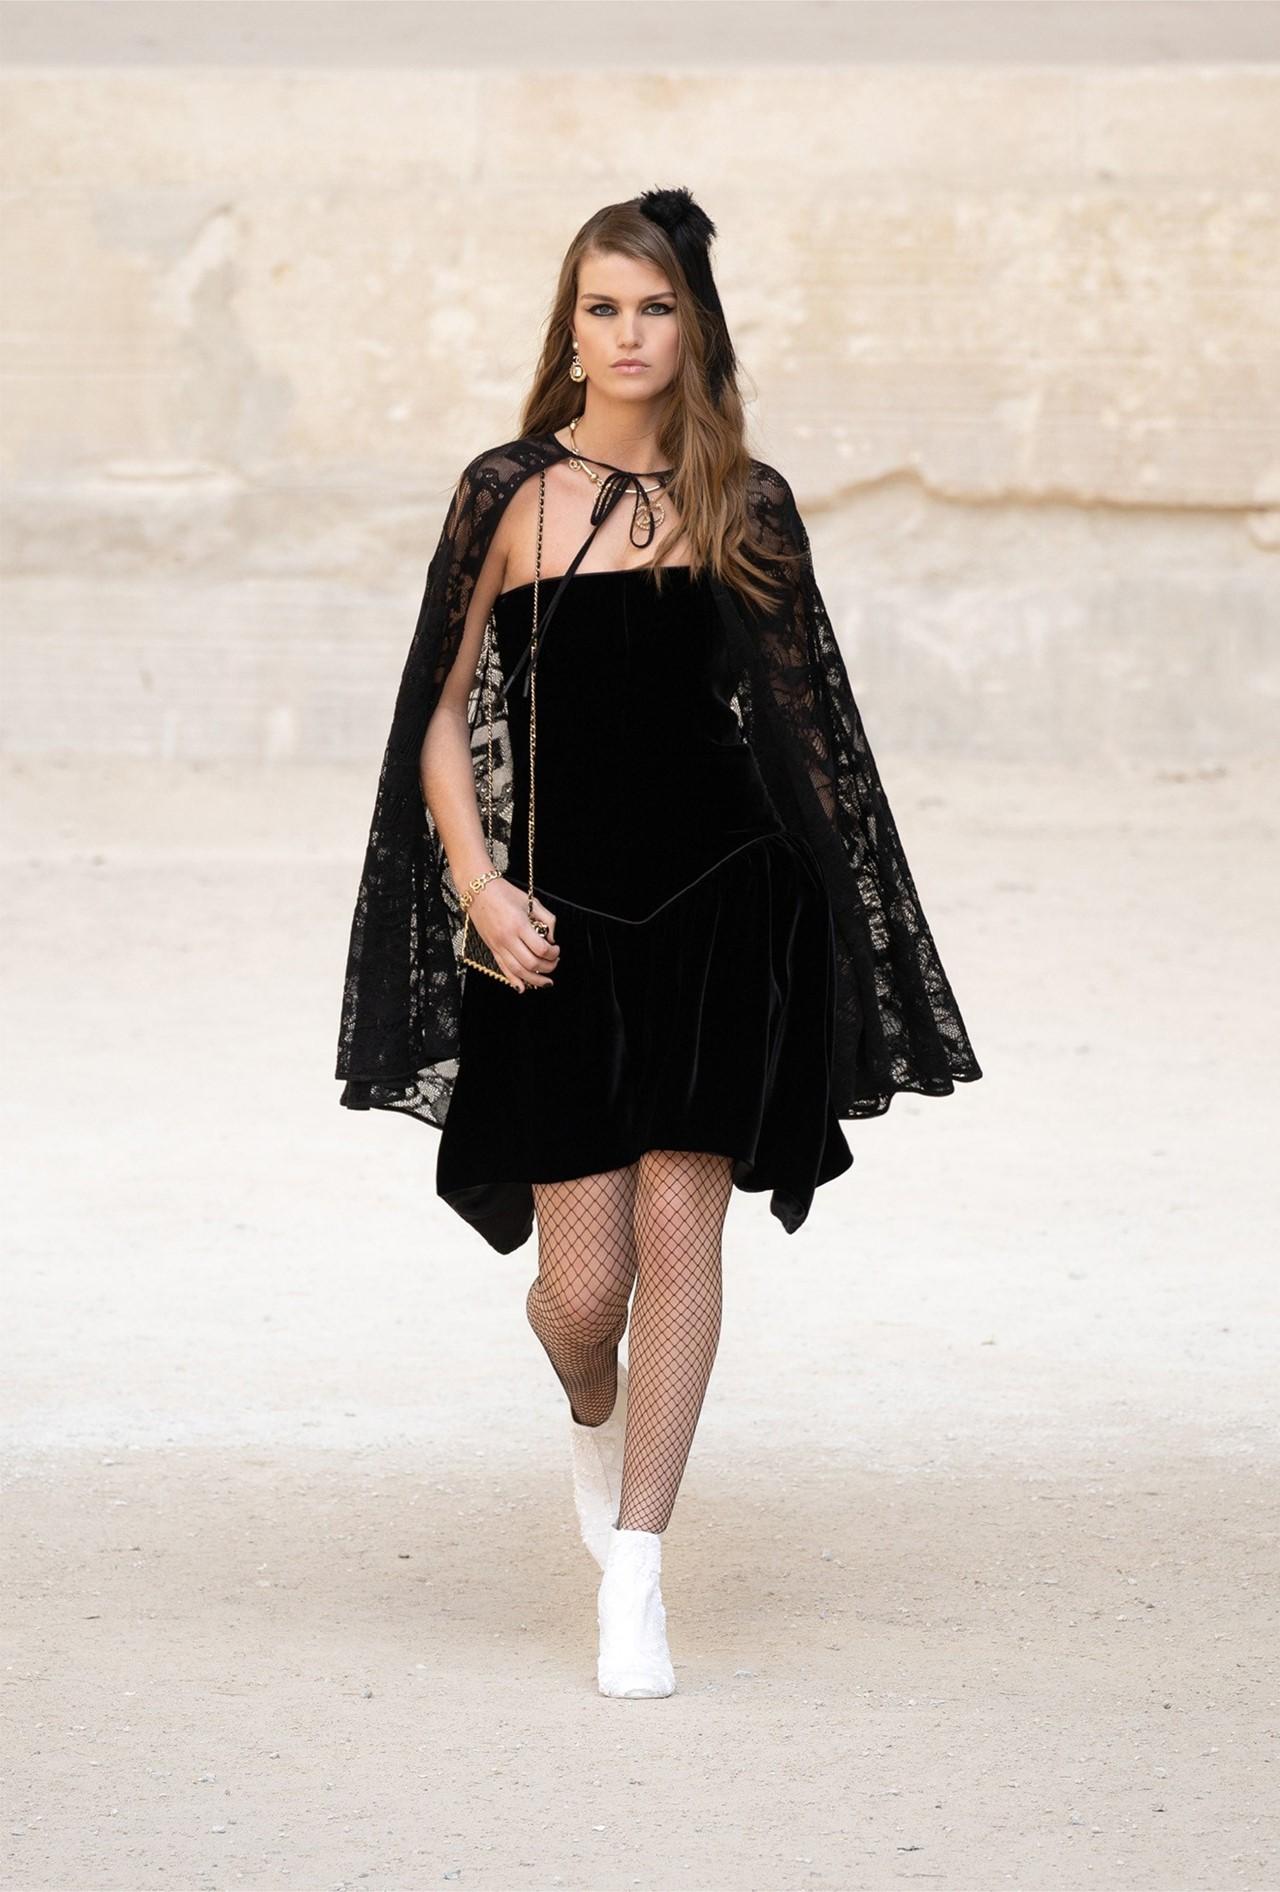 Chanel_Cruise_2022_Fashionela (63)